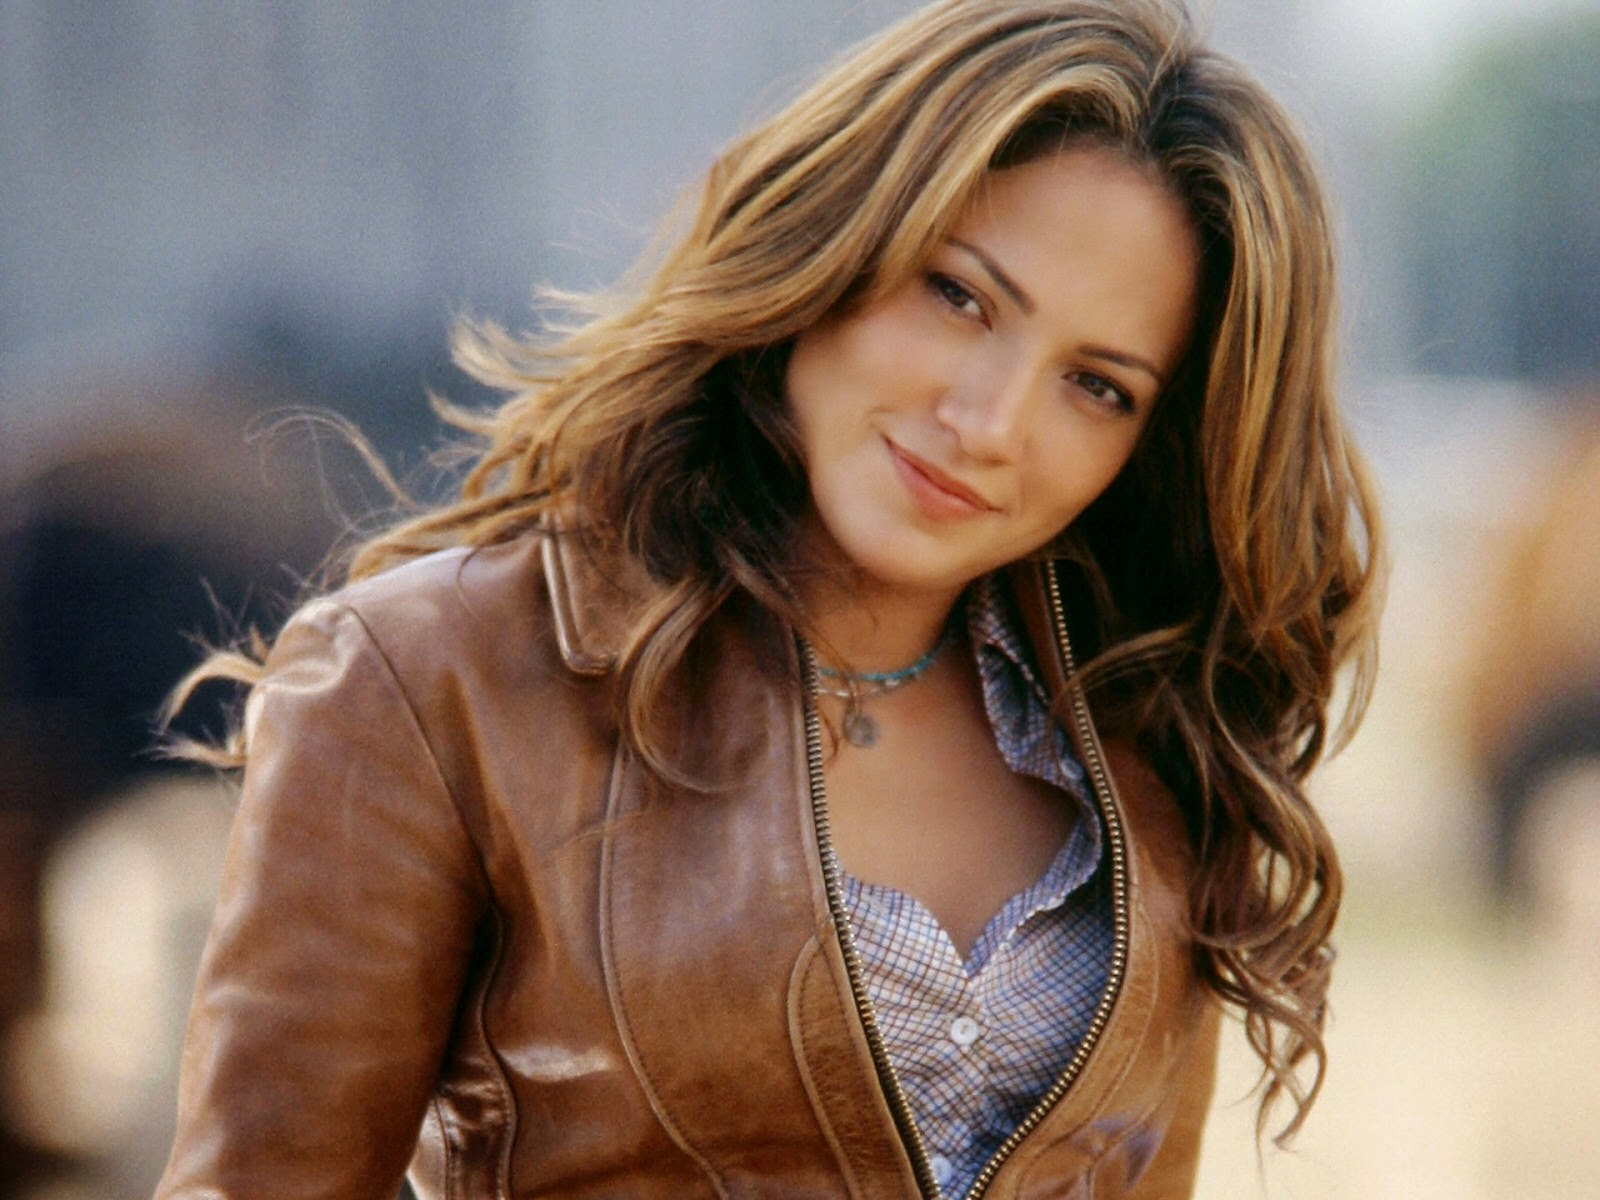 Jennifer Lopez Hd Image - Impremedianet-5186